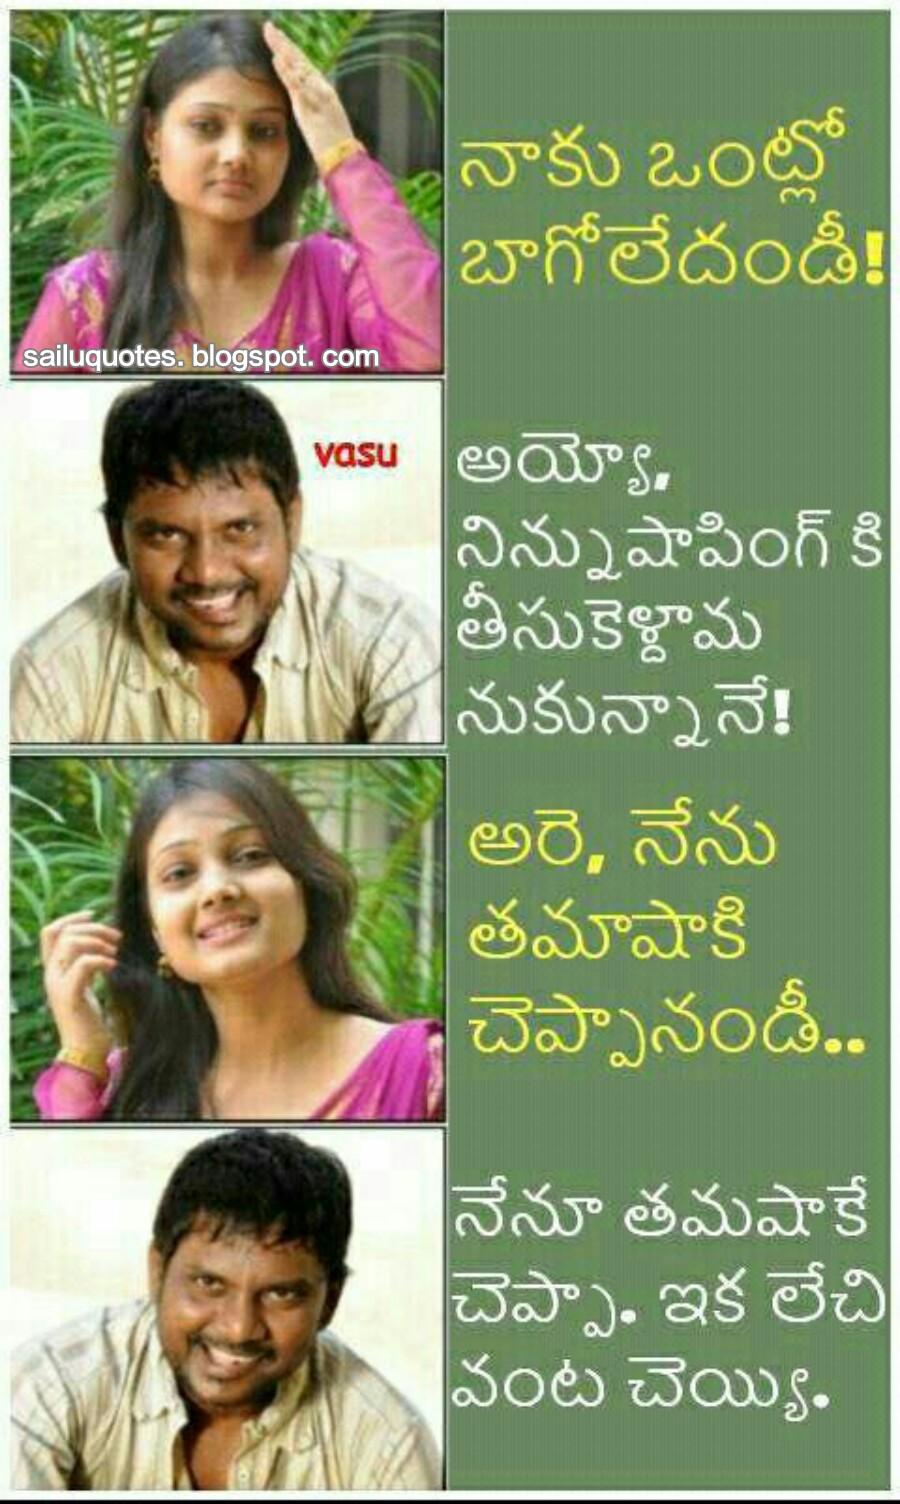 Telugu Punches And Jokes : telugu, punches, jokes, Facebook,telugu, Trolls,brahmi, Punches,telugu, Punch, Dilogues,Telugu, Quotes,english, Quotes:, Chesa...